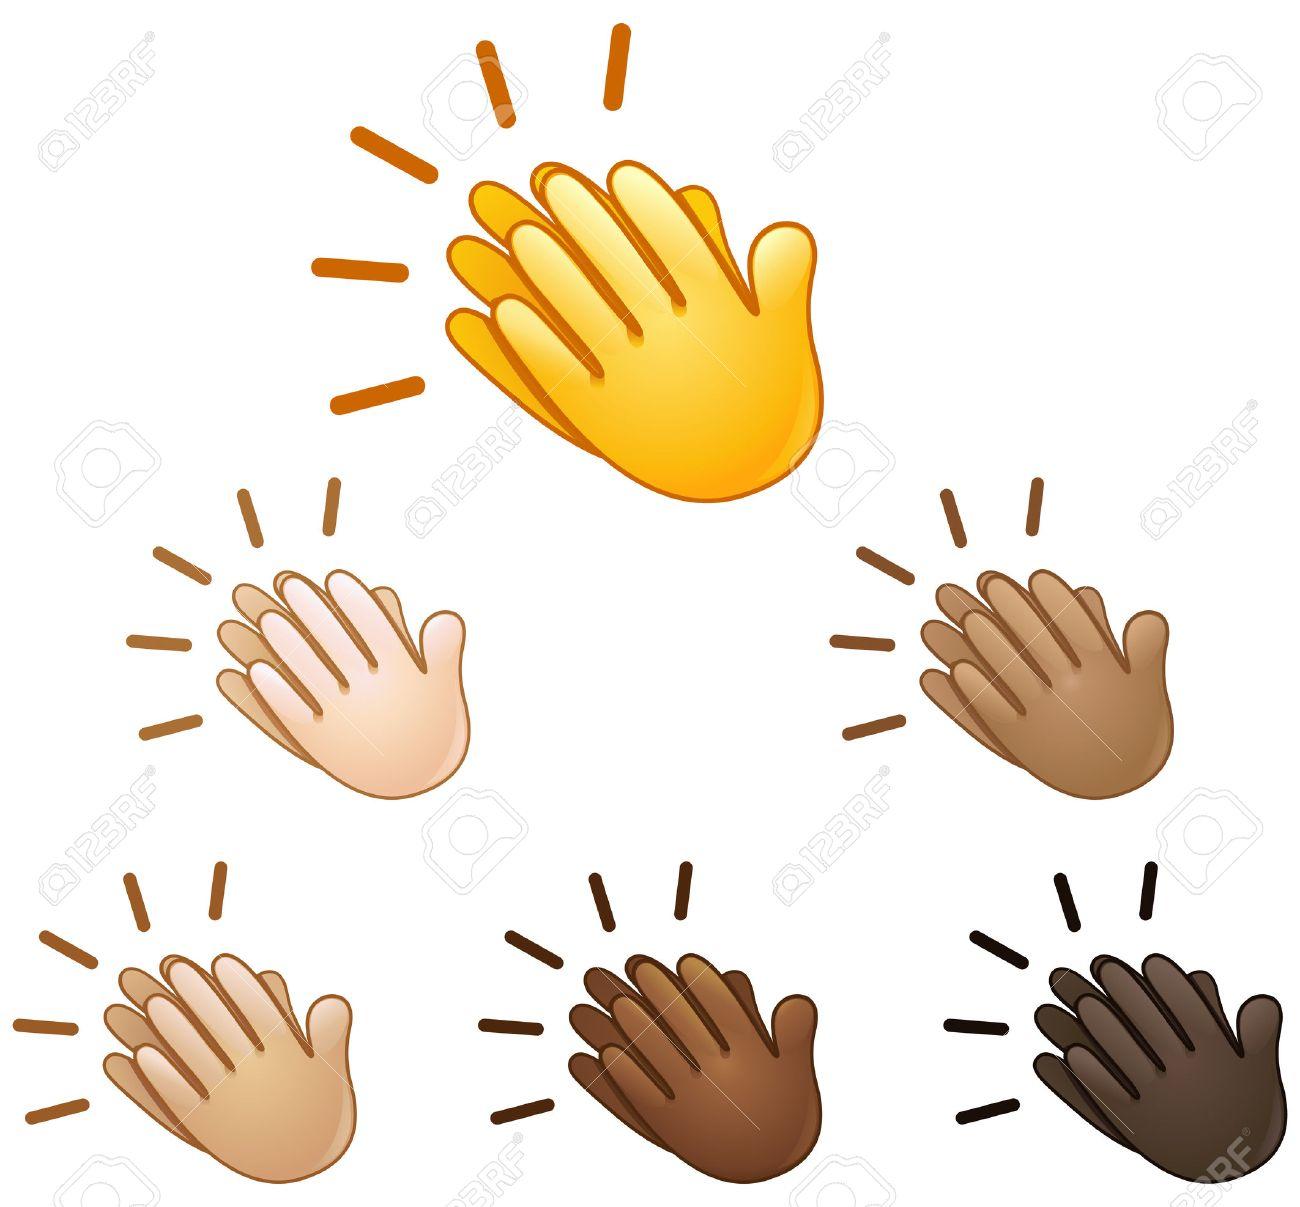 Clapping hands sign emoji set of various skin tones - 63994608